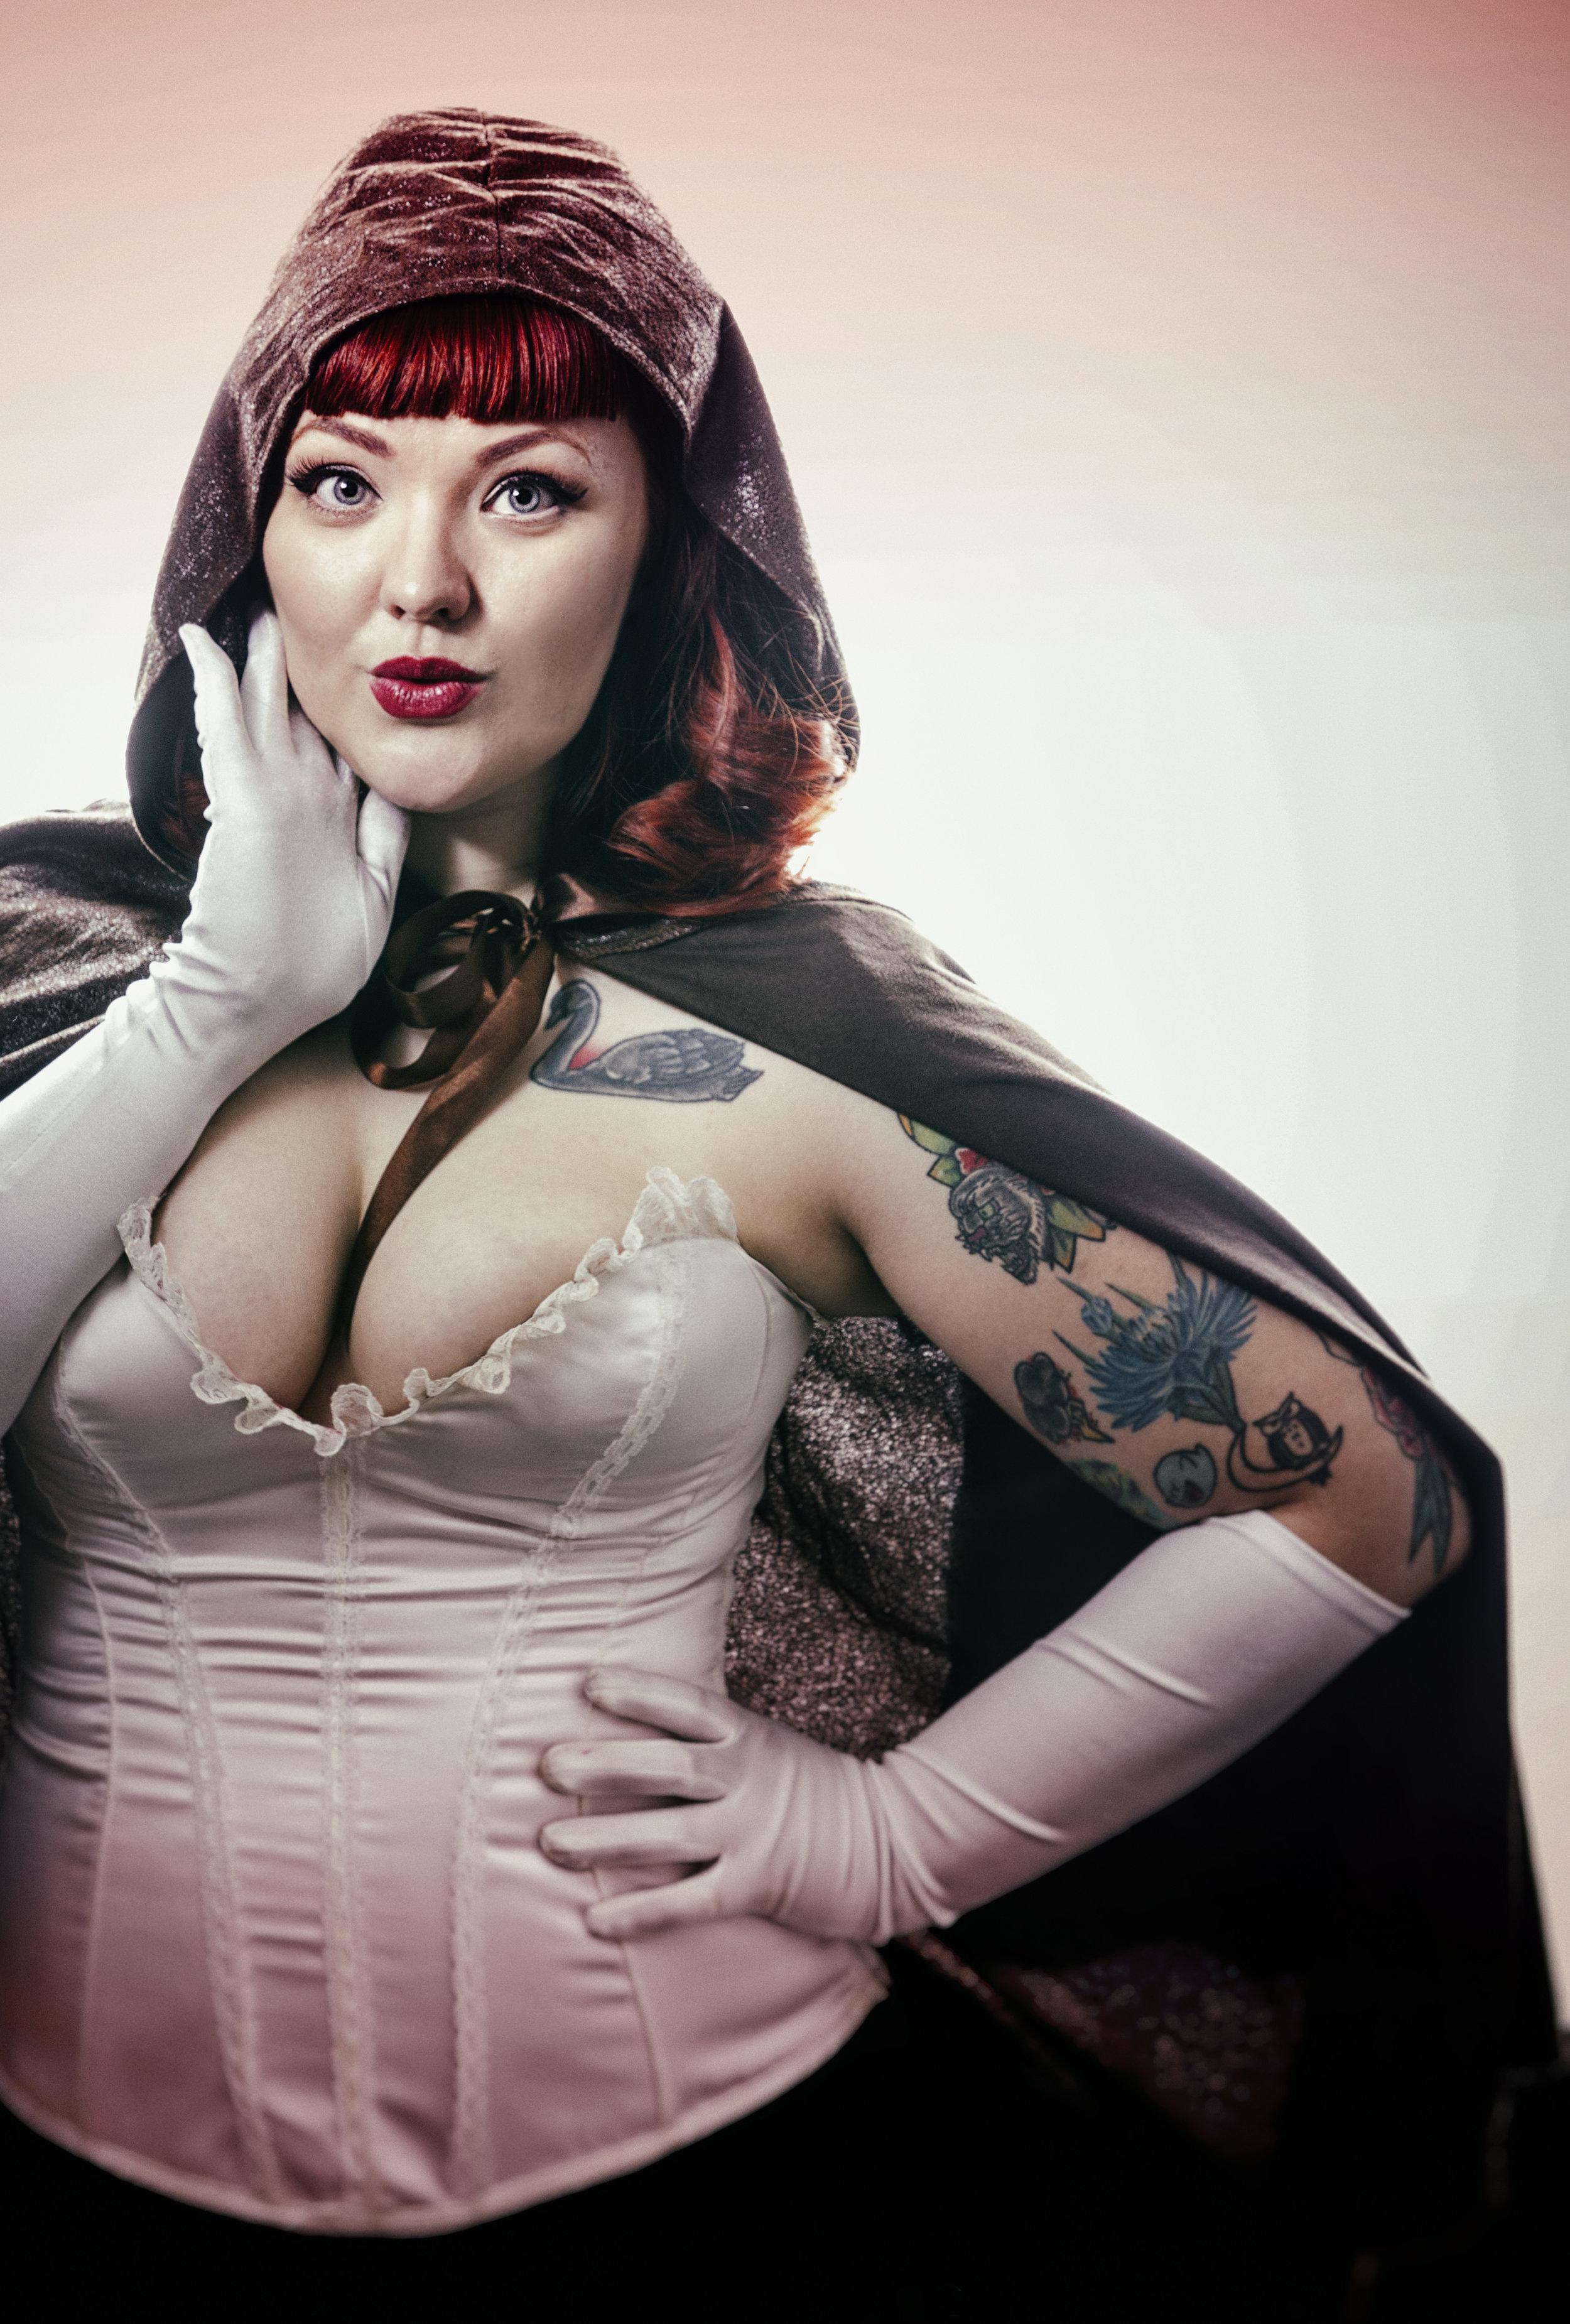 las_vegas_fantasy_photography_inclusive_package_photographer_casey_jade_composition_artist_costume.jpg